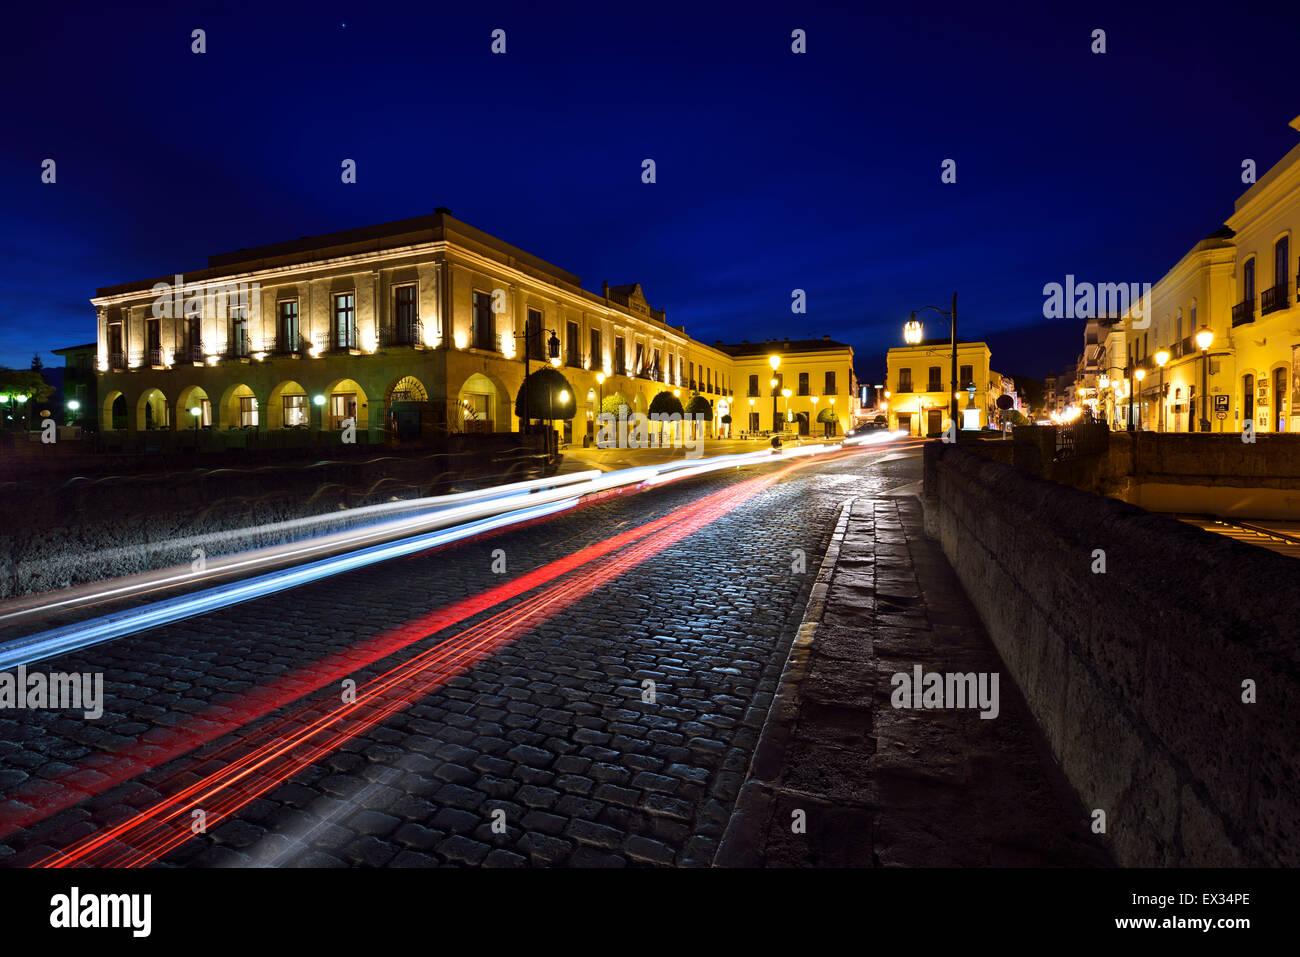 Indigo sky and car lights over Plaza Espana and Puente Nuevo bridge at dusk in Ronda Spain - Stock Image